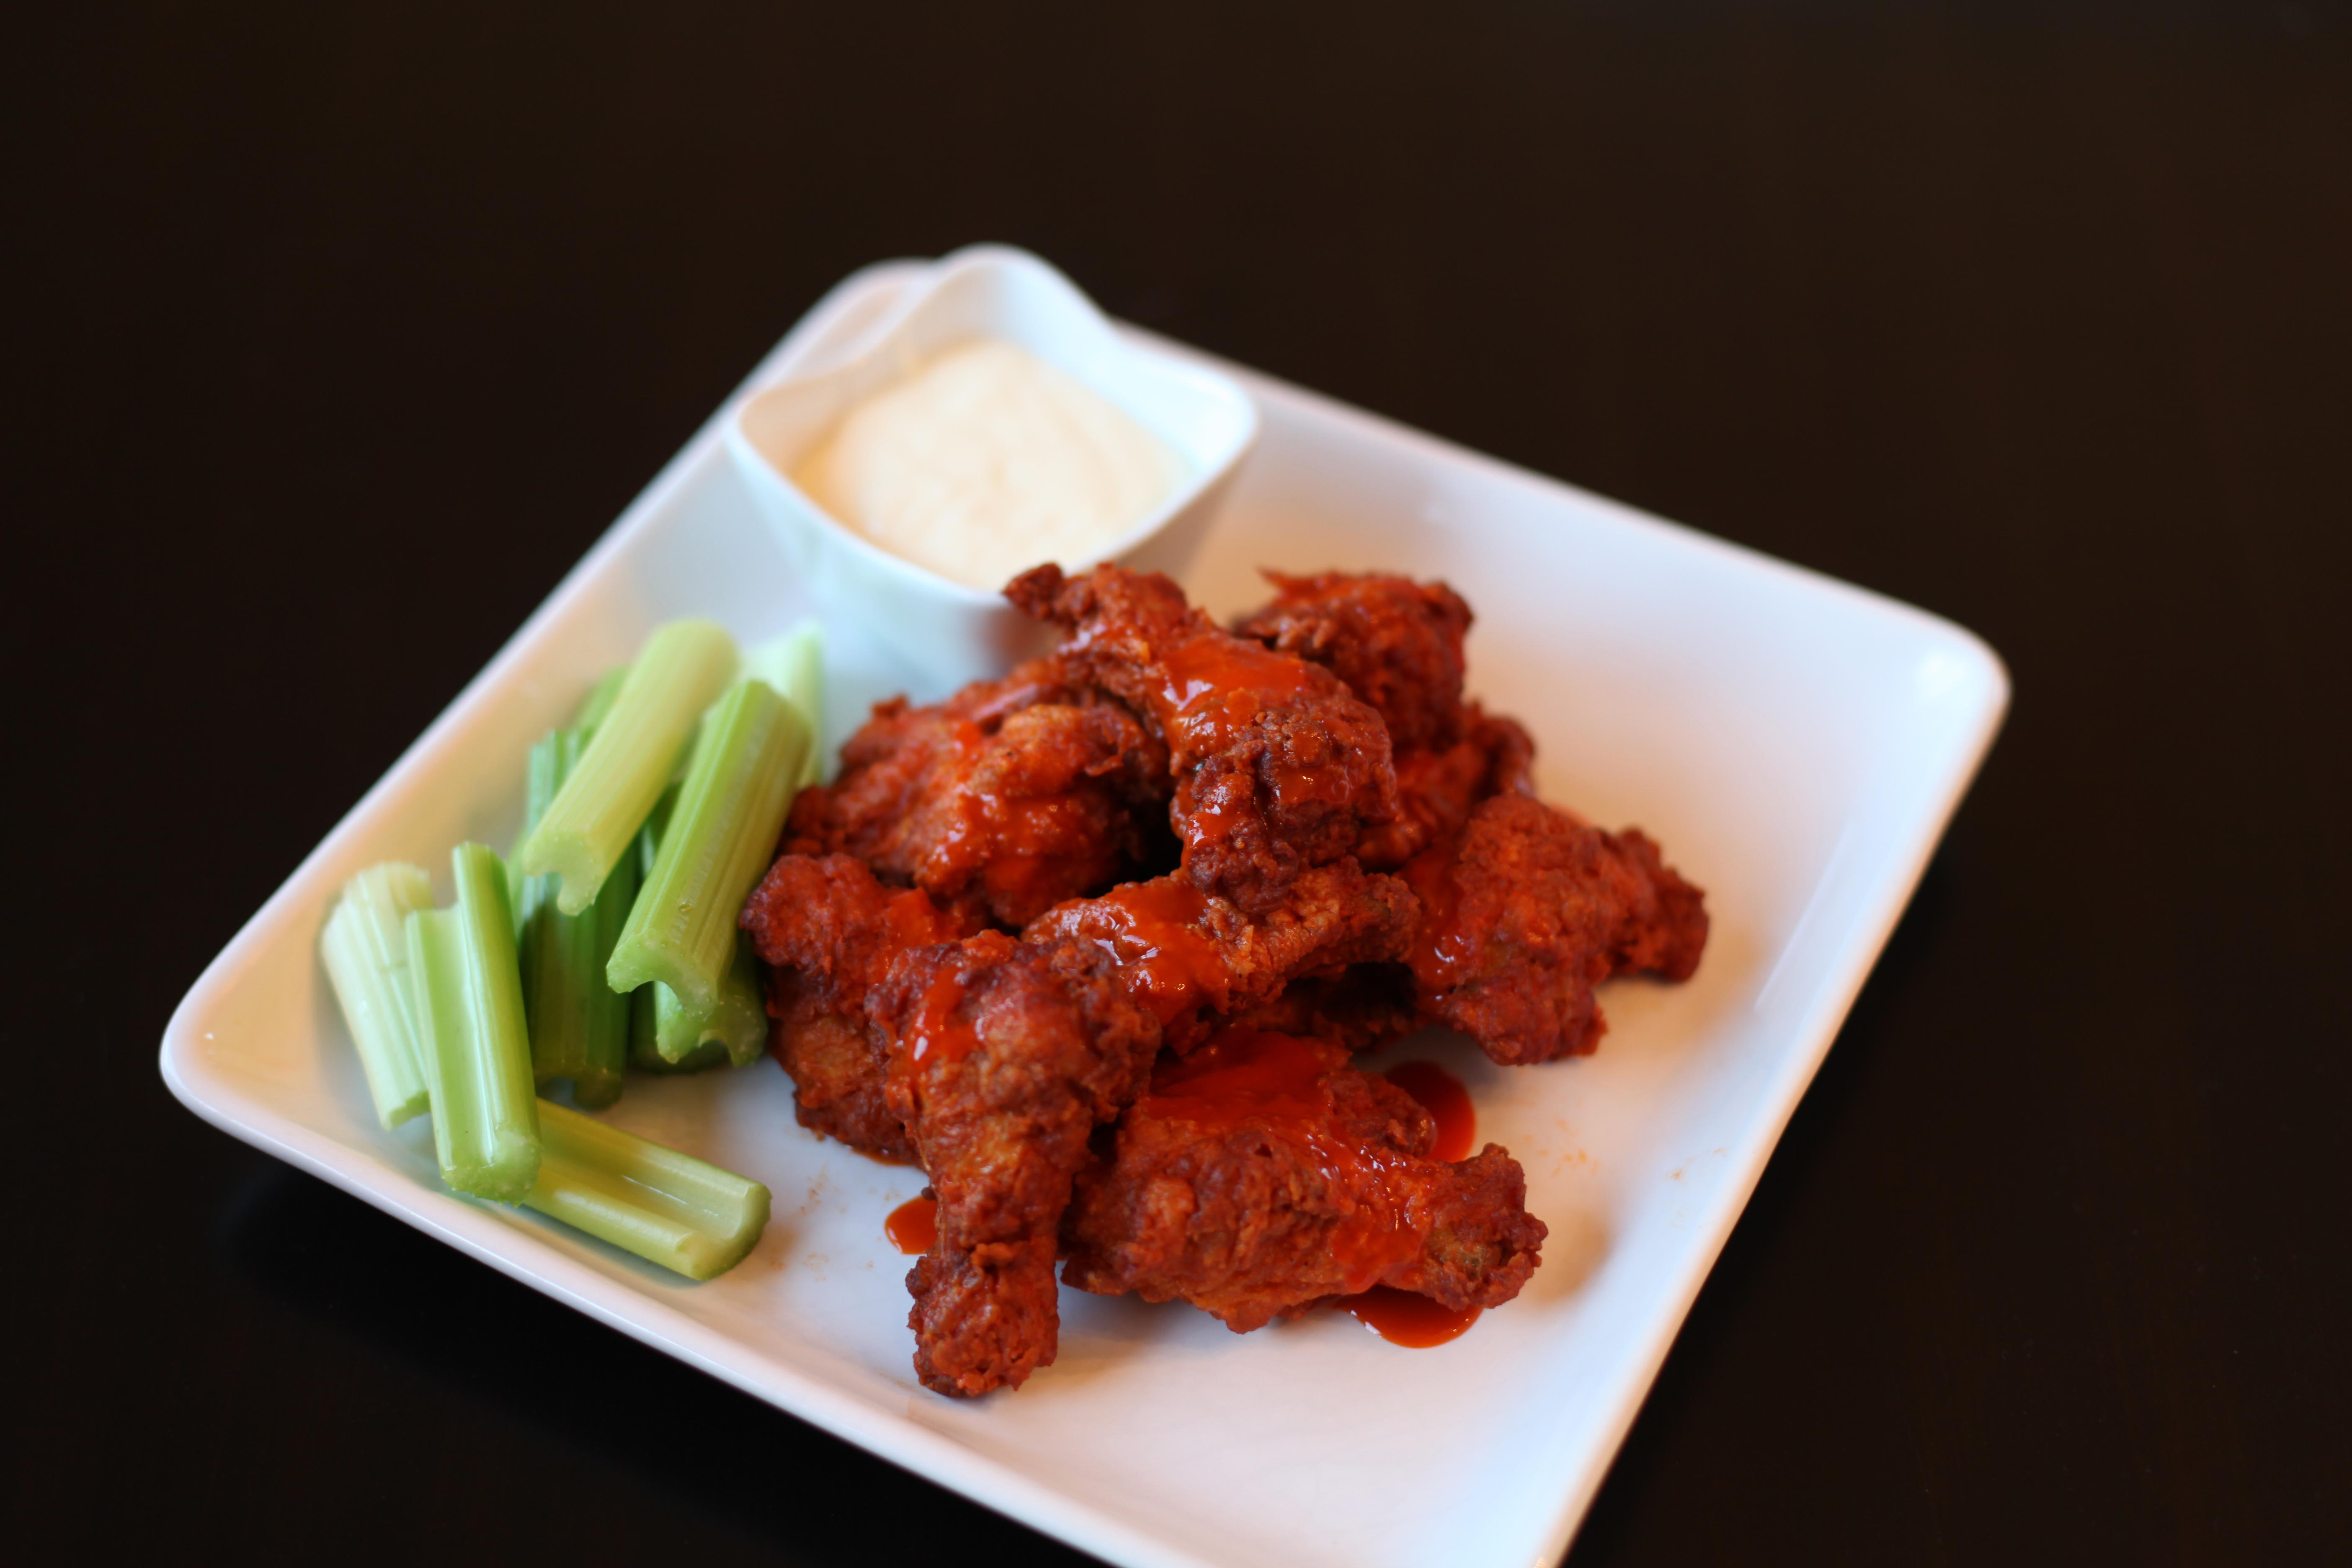 Crunchy Buffalo Hot Wings | Bits and Bytes